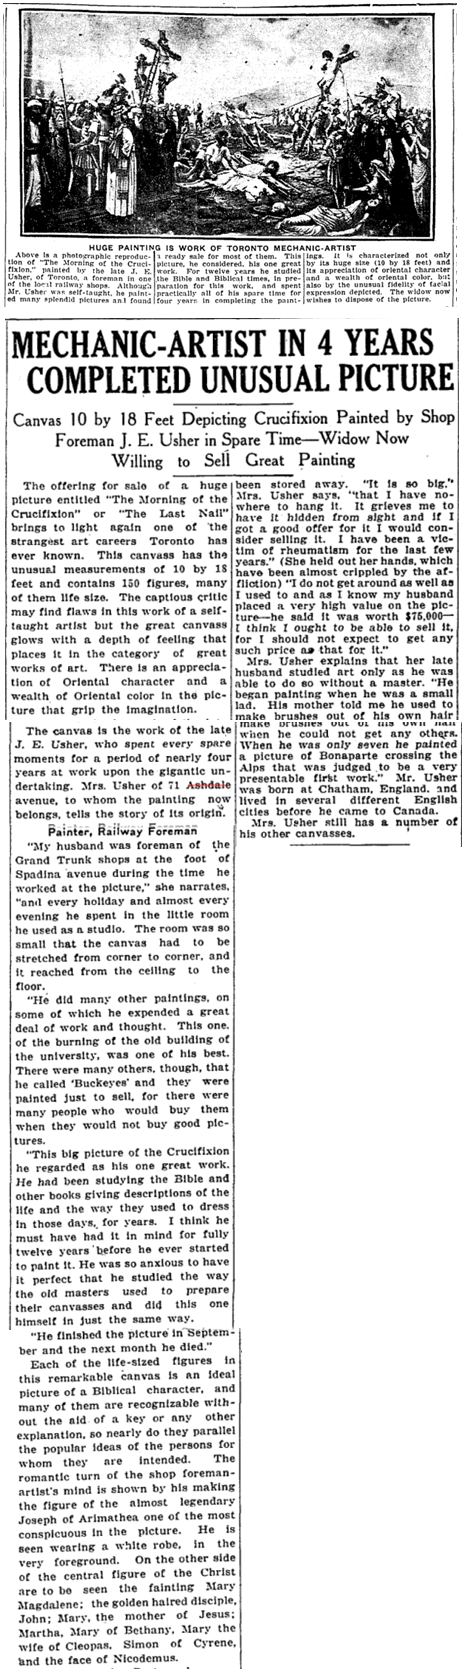 Toronto Star, Aug. 8, 1925